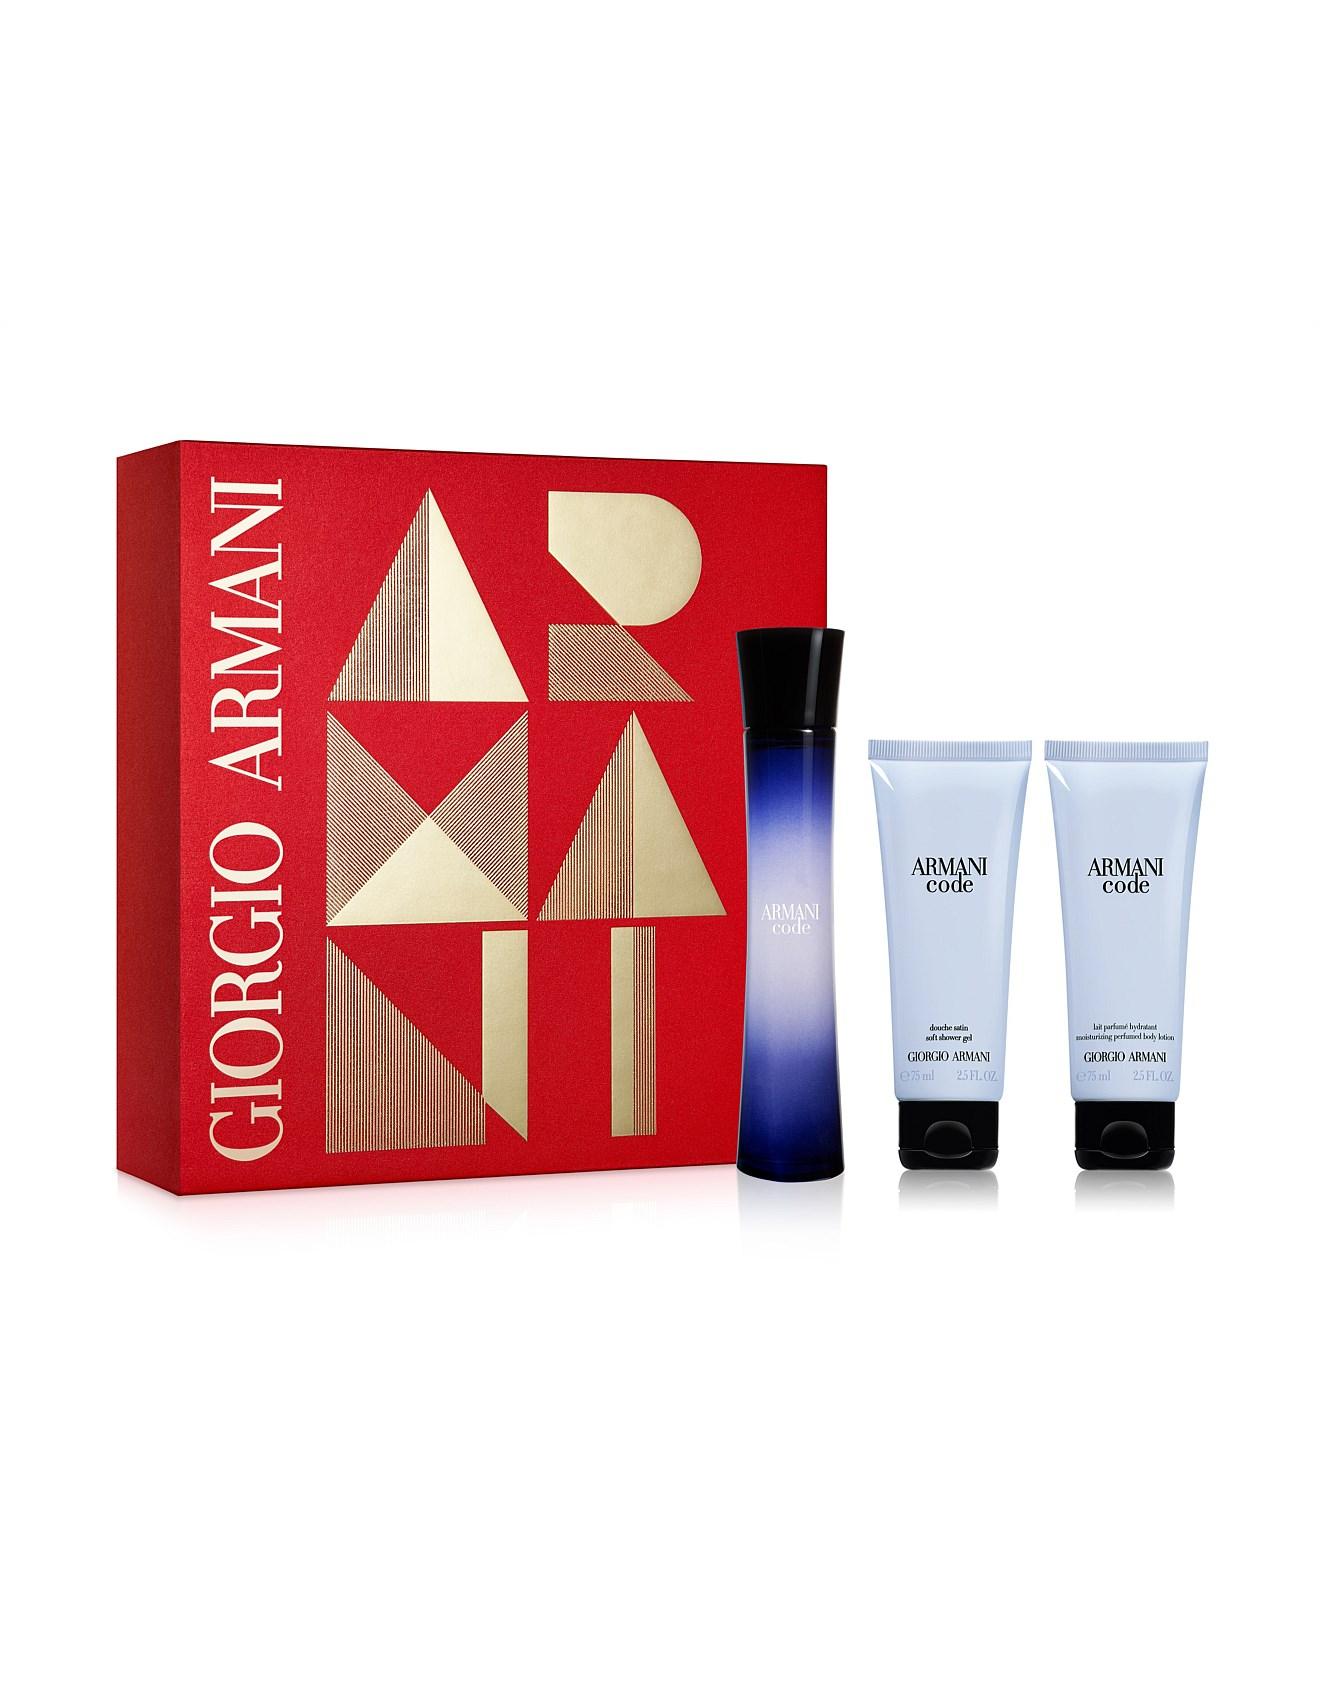 71a439cf6da Armani Code Femme EDP 75ml Gift Set